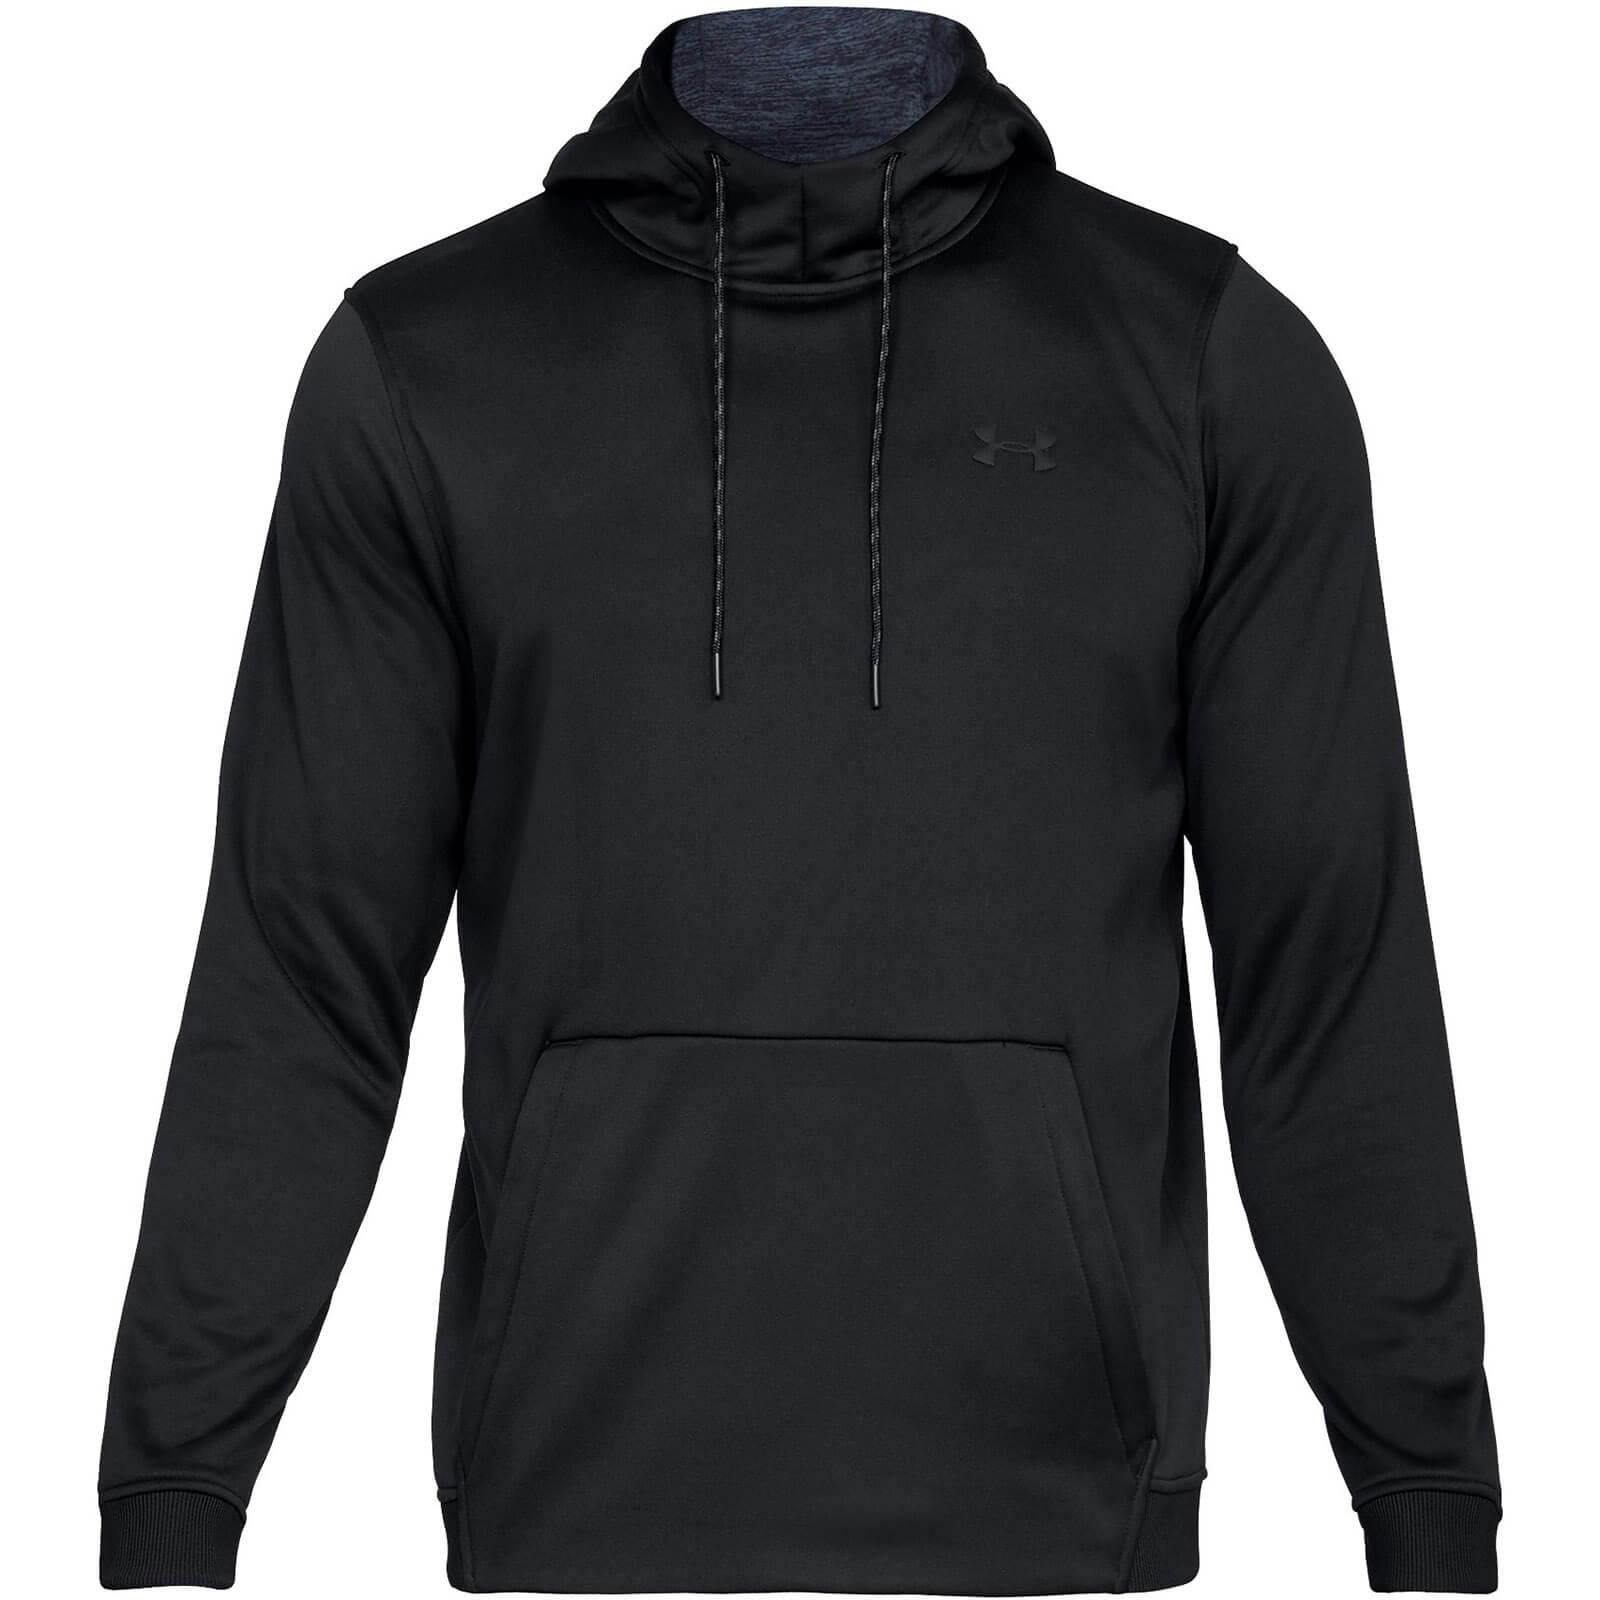 mens black under armour sweatshirt